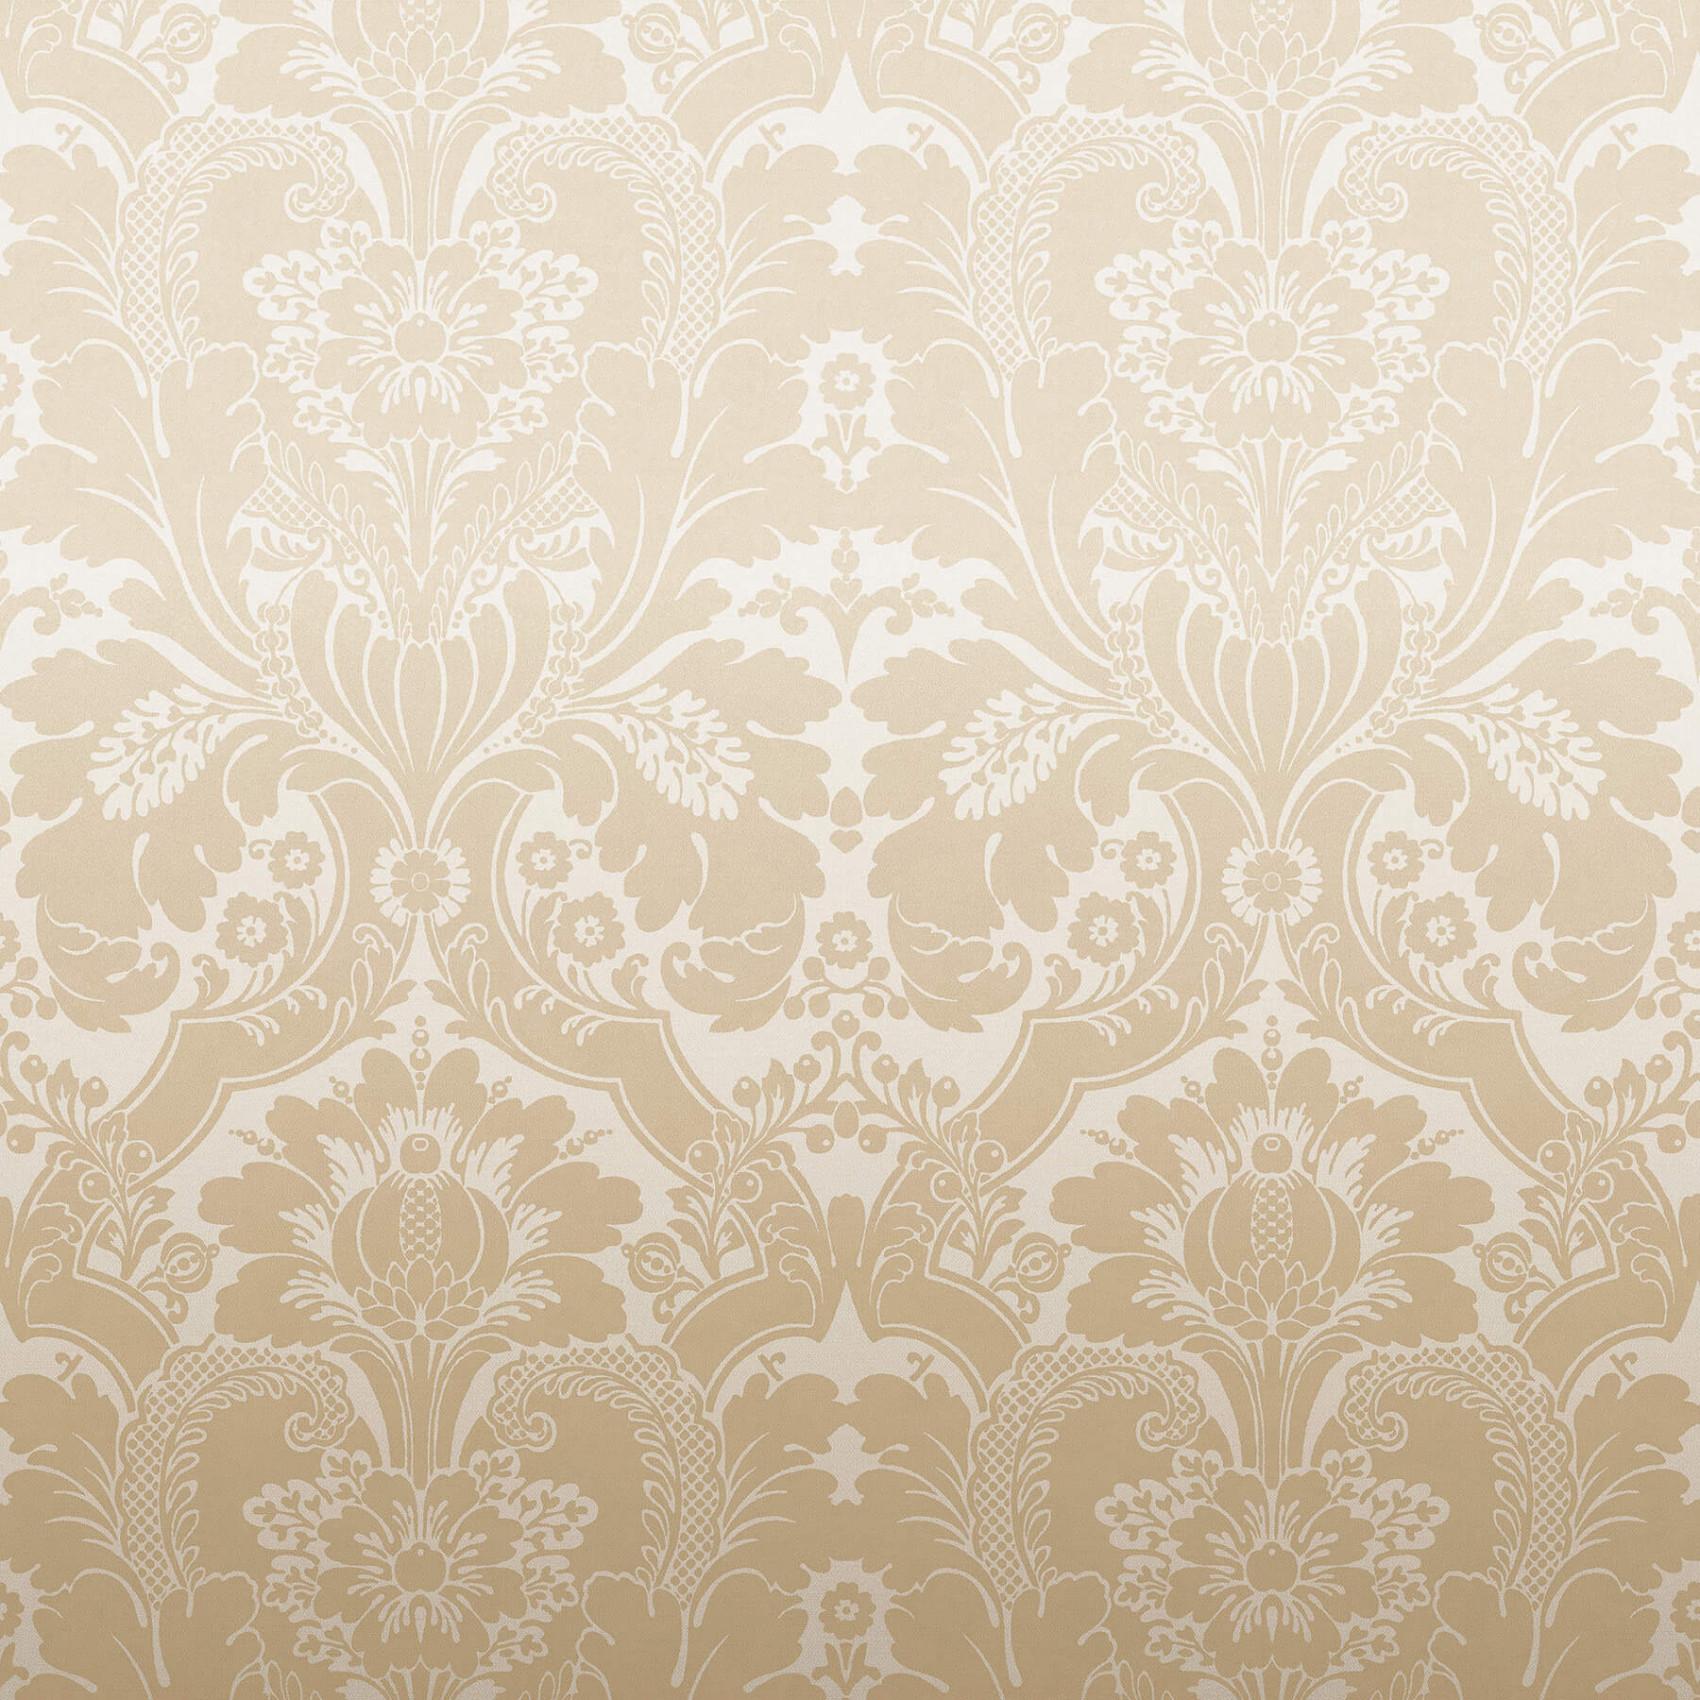 Buy St Jamess Park   Suede Fade Wallpaper Little Greene 1700x1700